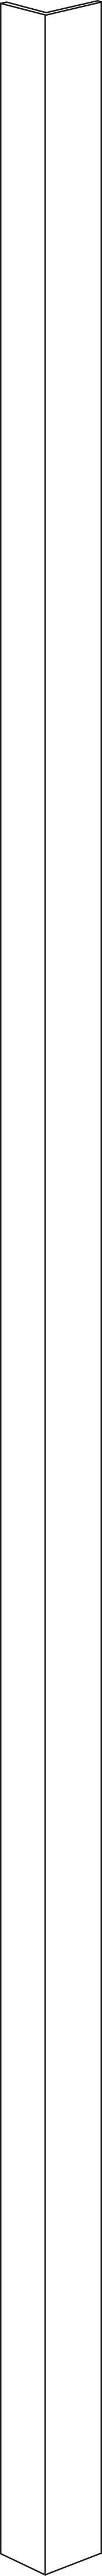 SIDOLIST S2/4 155 CM H